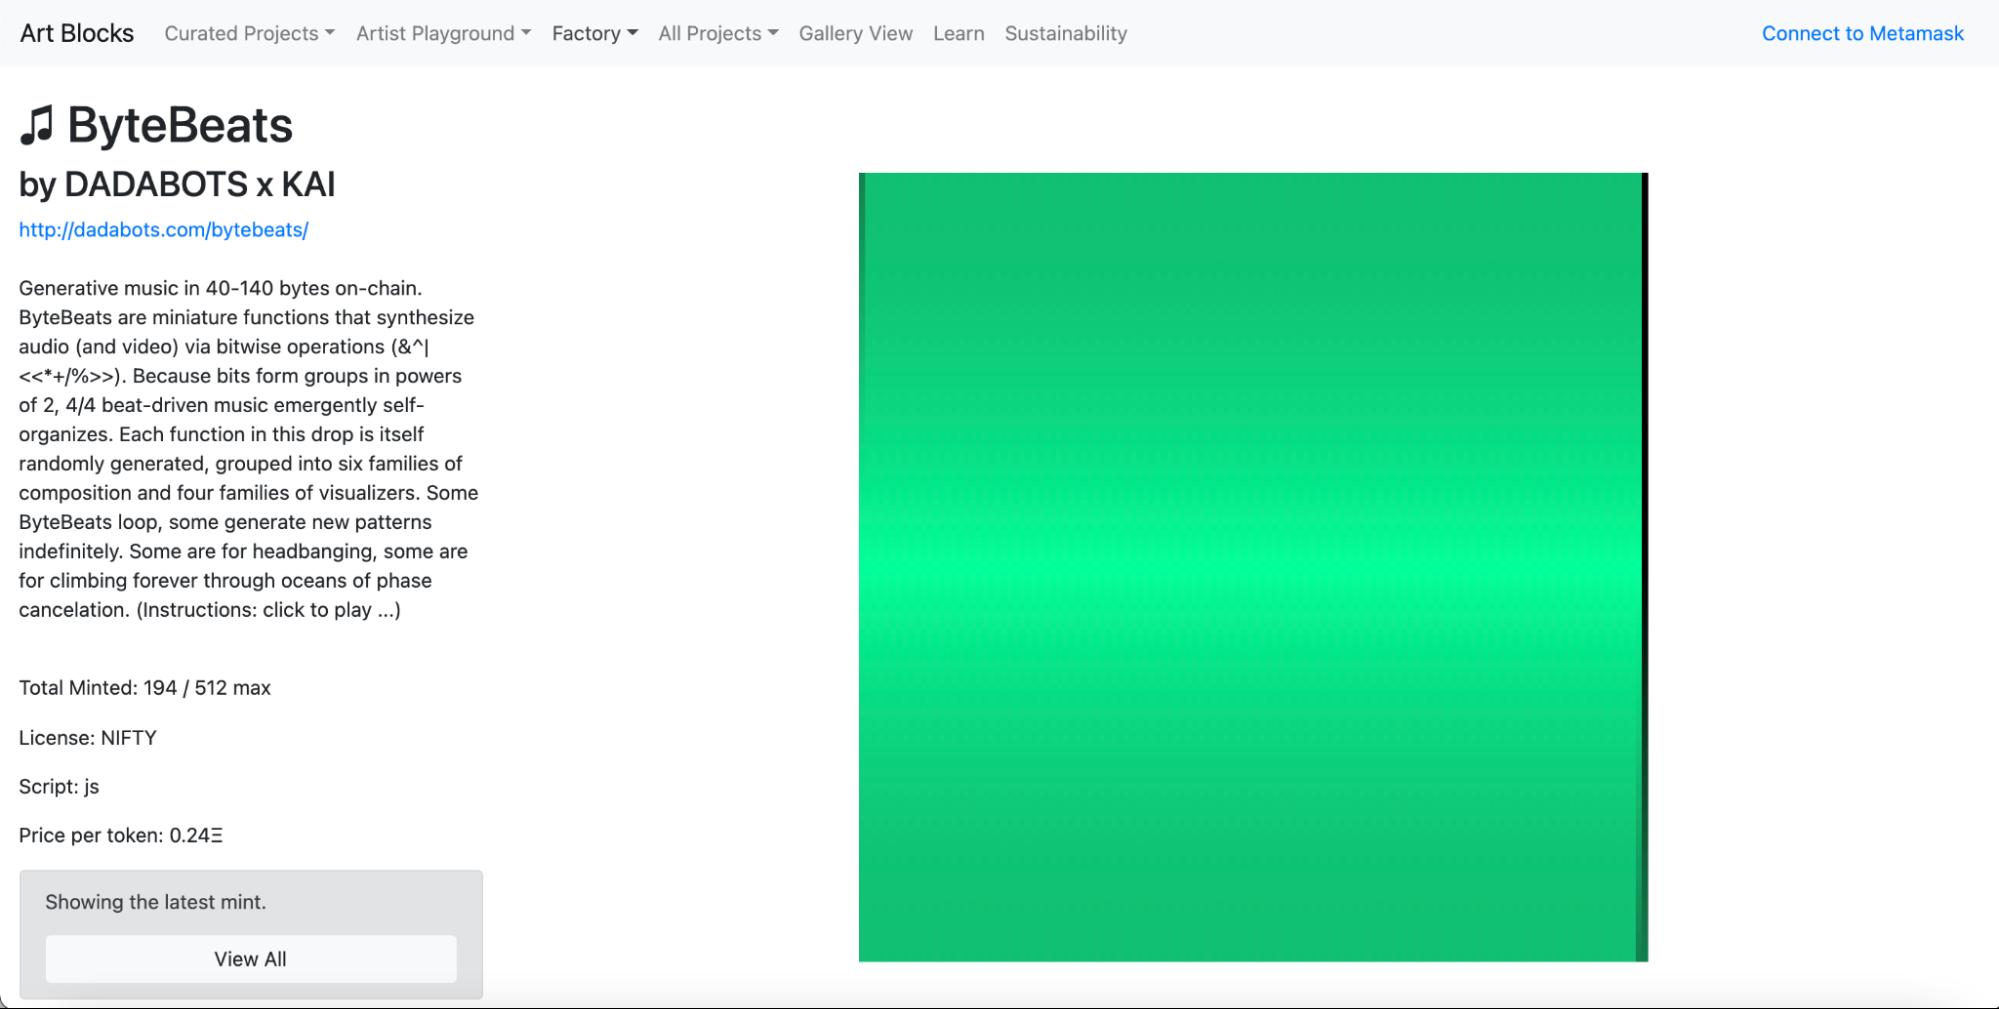 Art Blocks增速超老牌NFT平台 生成艺术是否会引发新的NFT热潮?